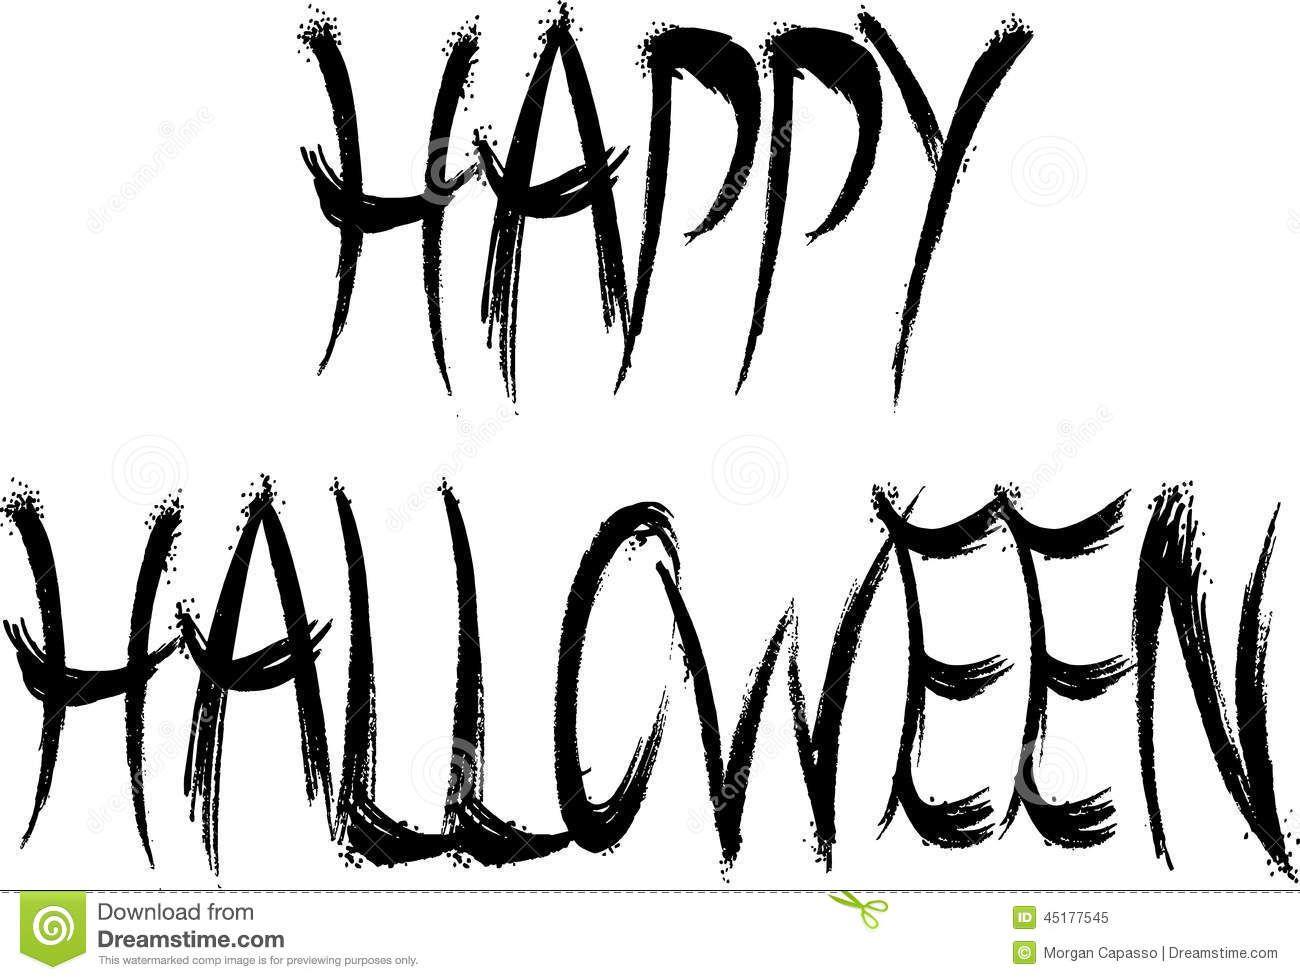 the word rome written in stylish cursive handwriting black and white ink grafica su dreamstime pinterest cursive handwriting - Halloween Writing Font